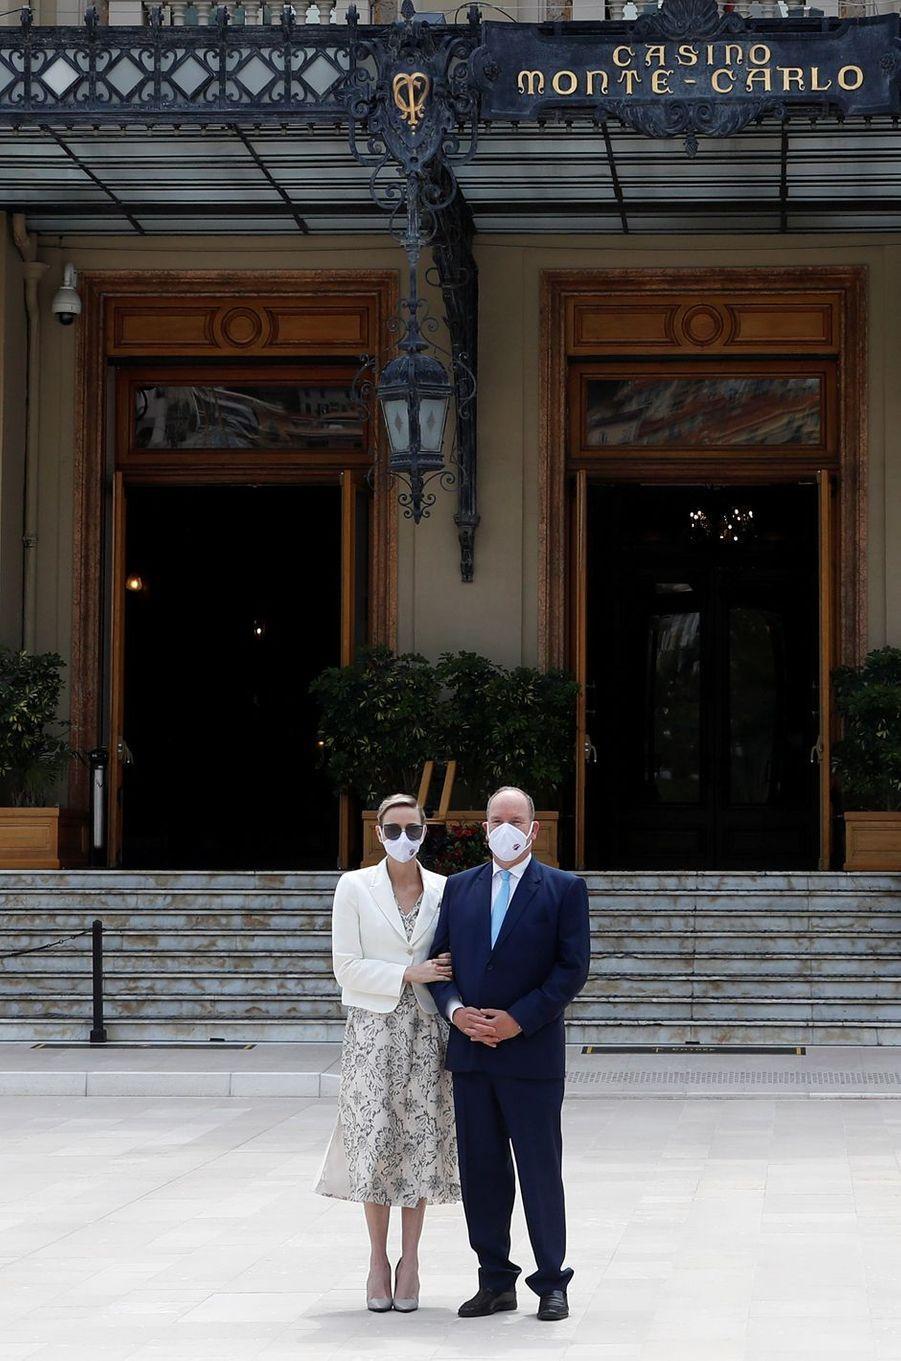 La princesse Charlène et le prince Albert II de Monaco devant le Casino de Monaco, le 2 juin 2020